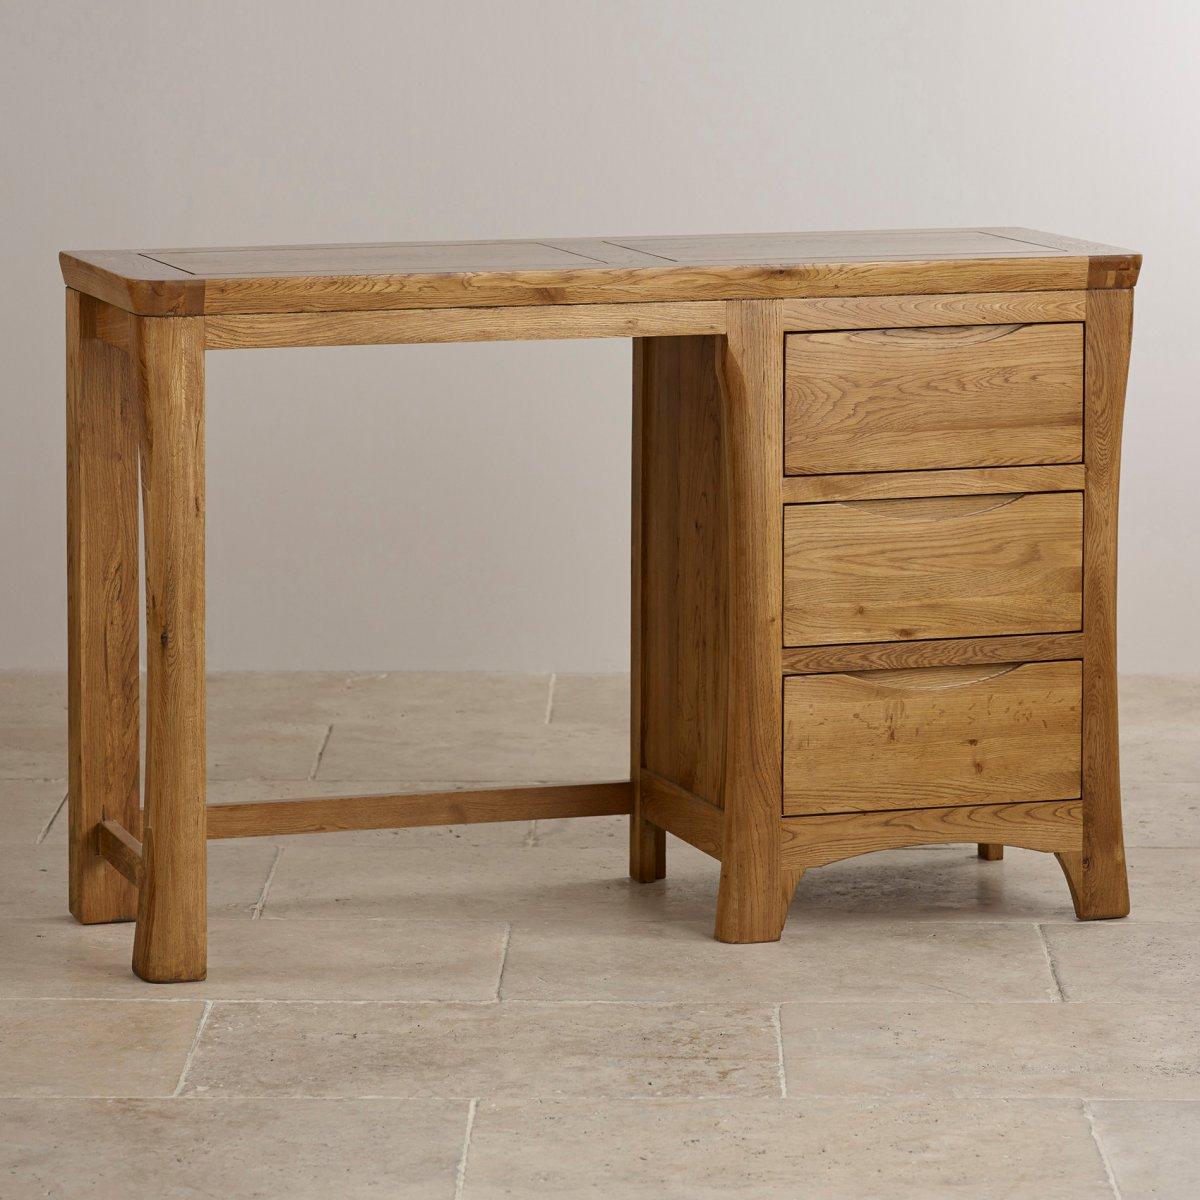 Orrick dressing table in rustic solid oak furniture land